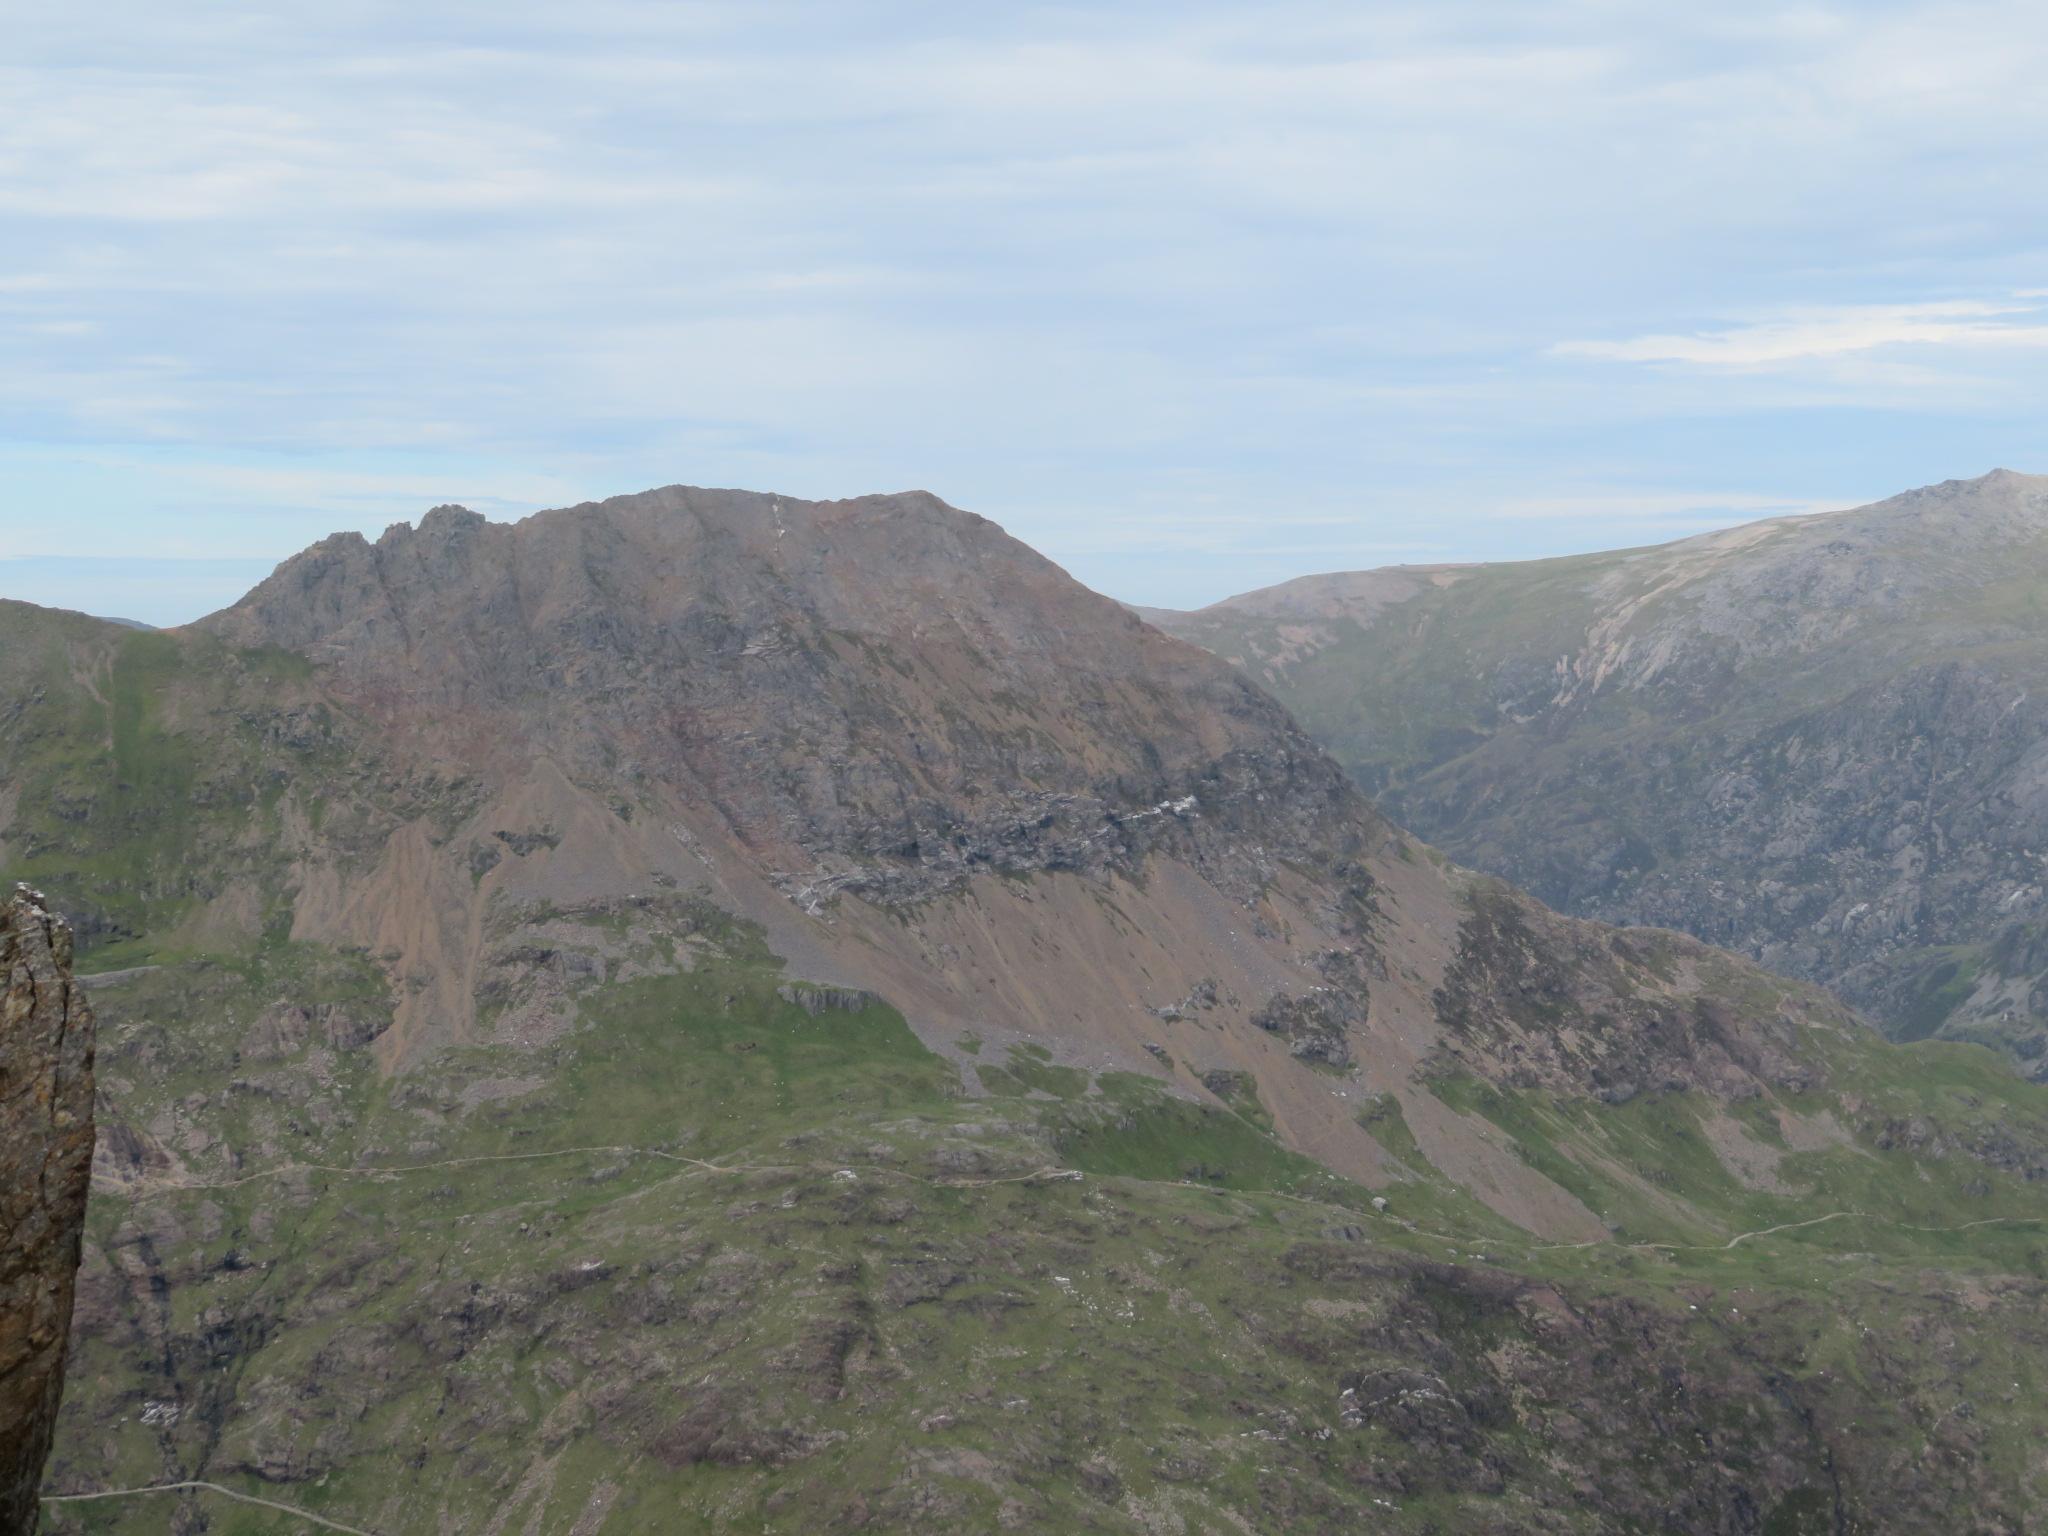 United Kingdom Wales Snowdonia, Snowdon Horseshoe, Crib Goch from LLiwedd, Walkopedia